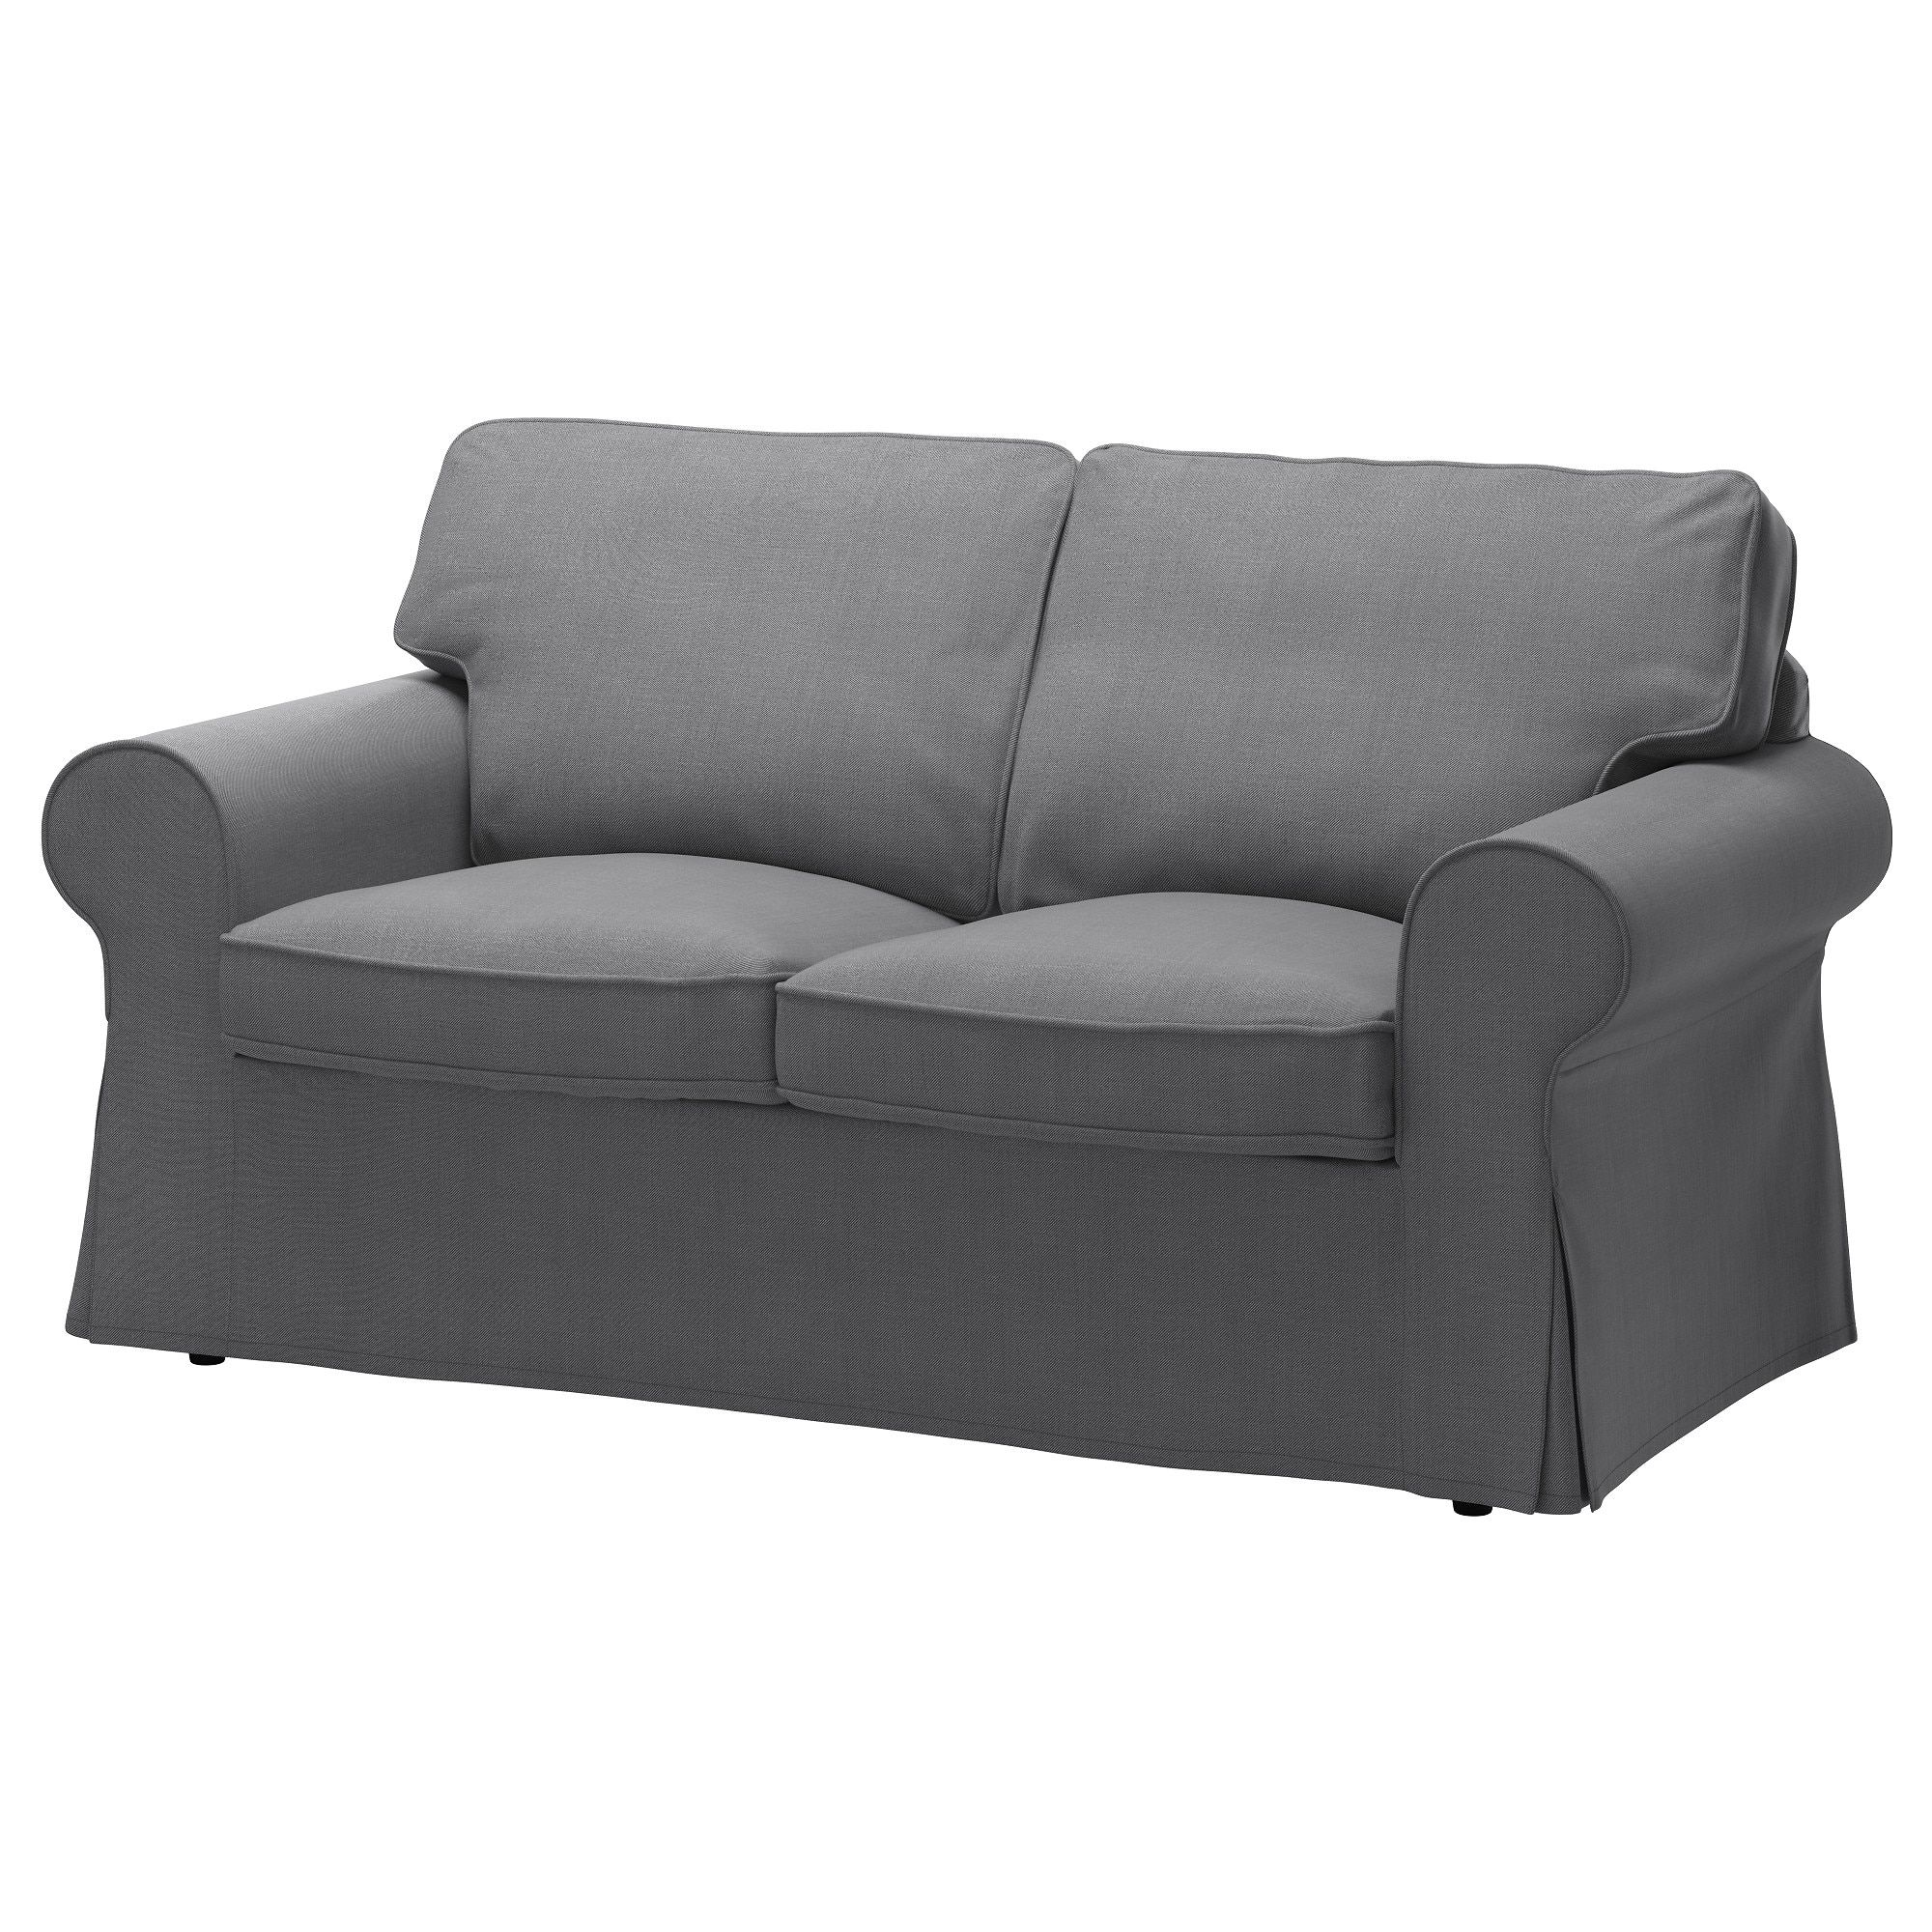 ektorp loveseat nordvalla dark gray new apt ektorp sofa ikea rh pinterest com